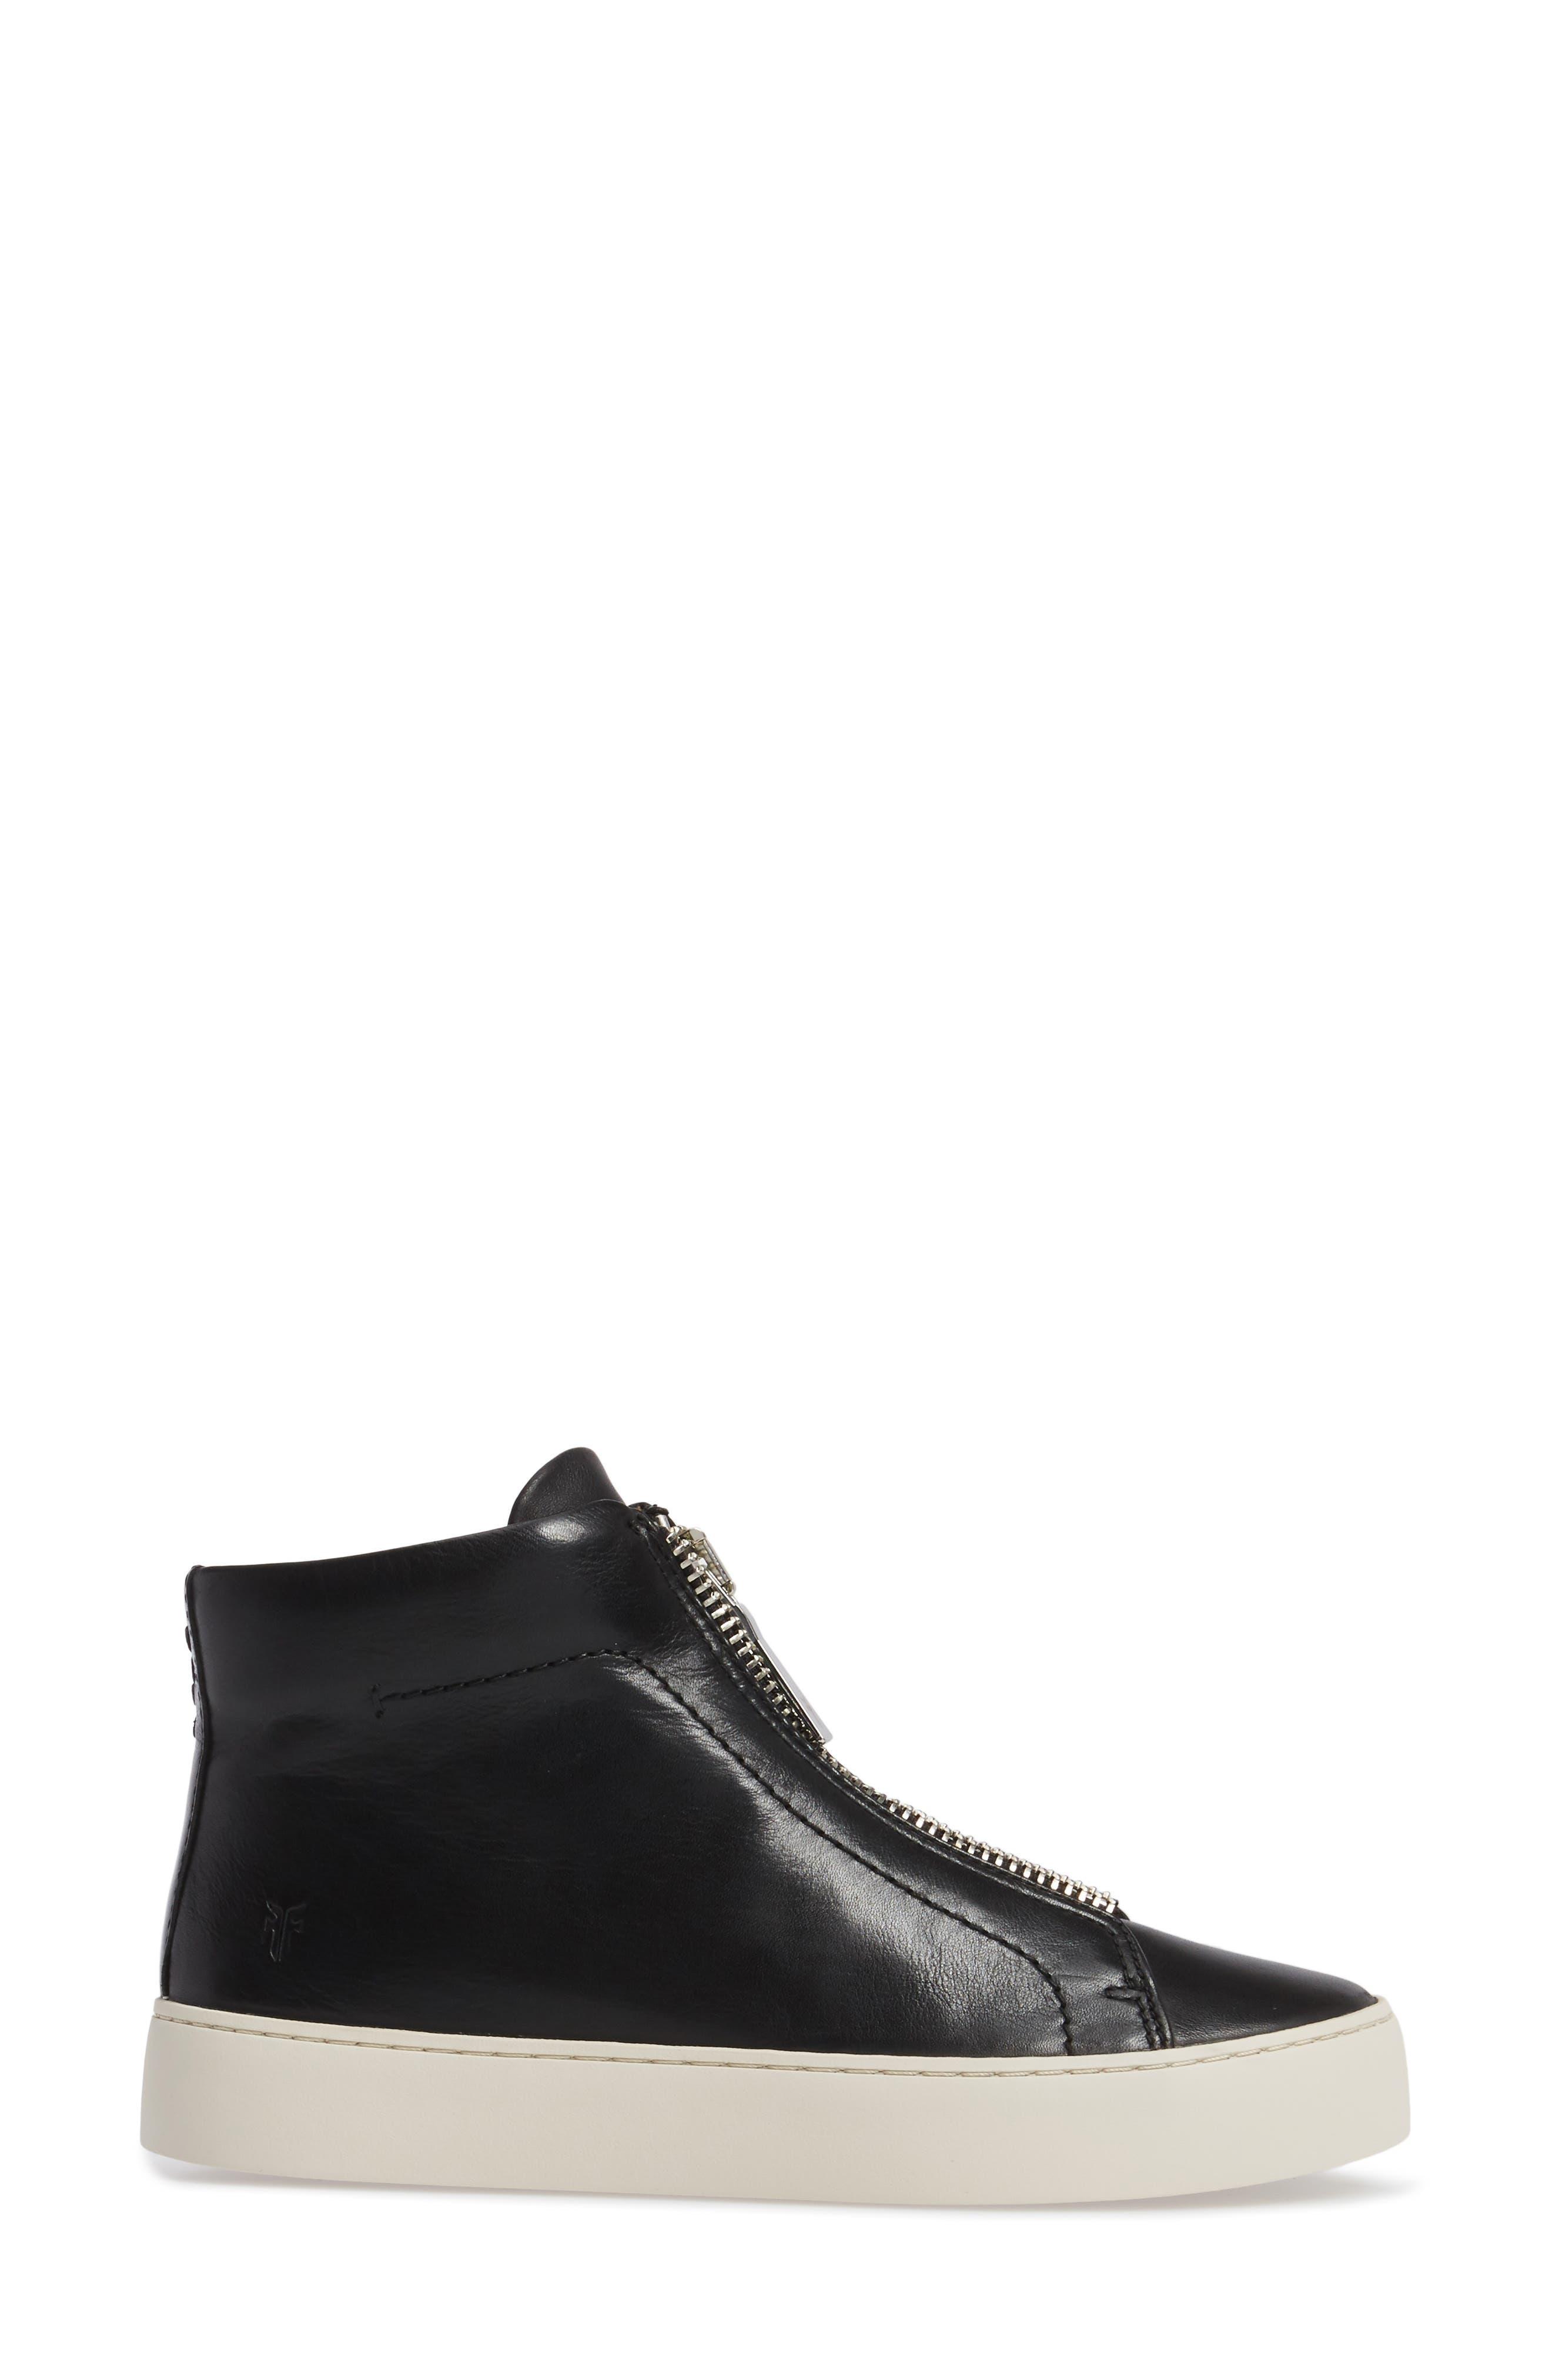 FRYE, Lena Zip High Top Sneaker, Alternate thumbnail 3, color, BLACK LEATHER